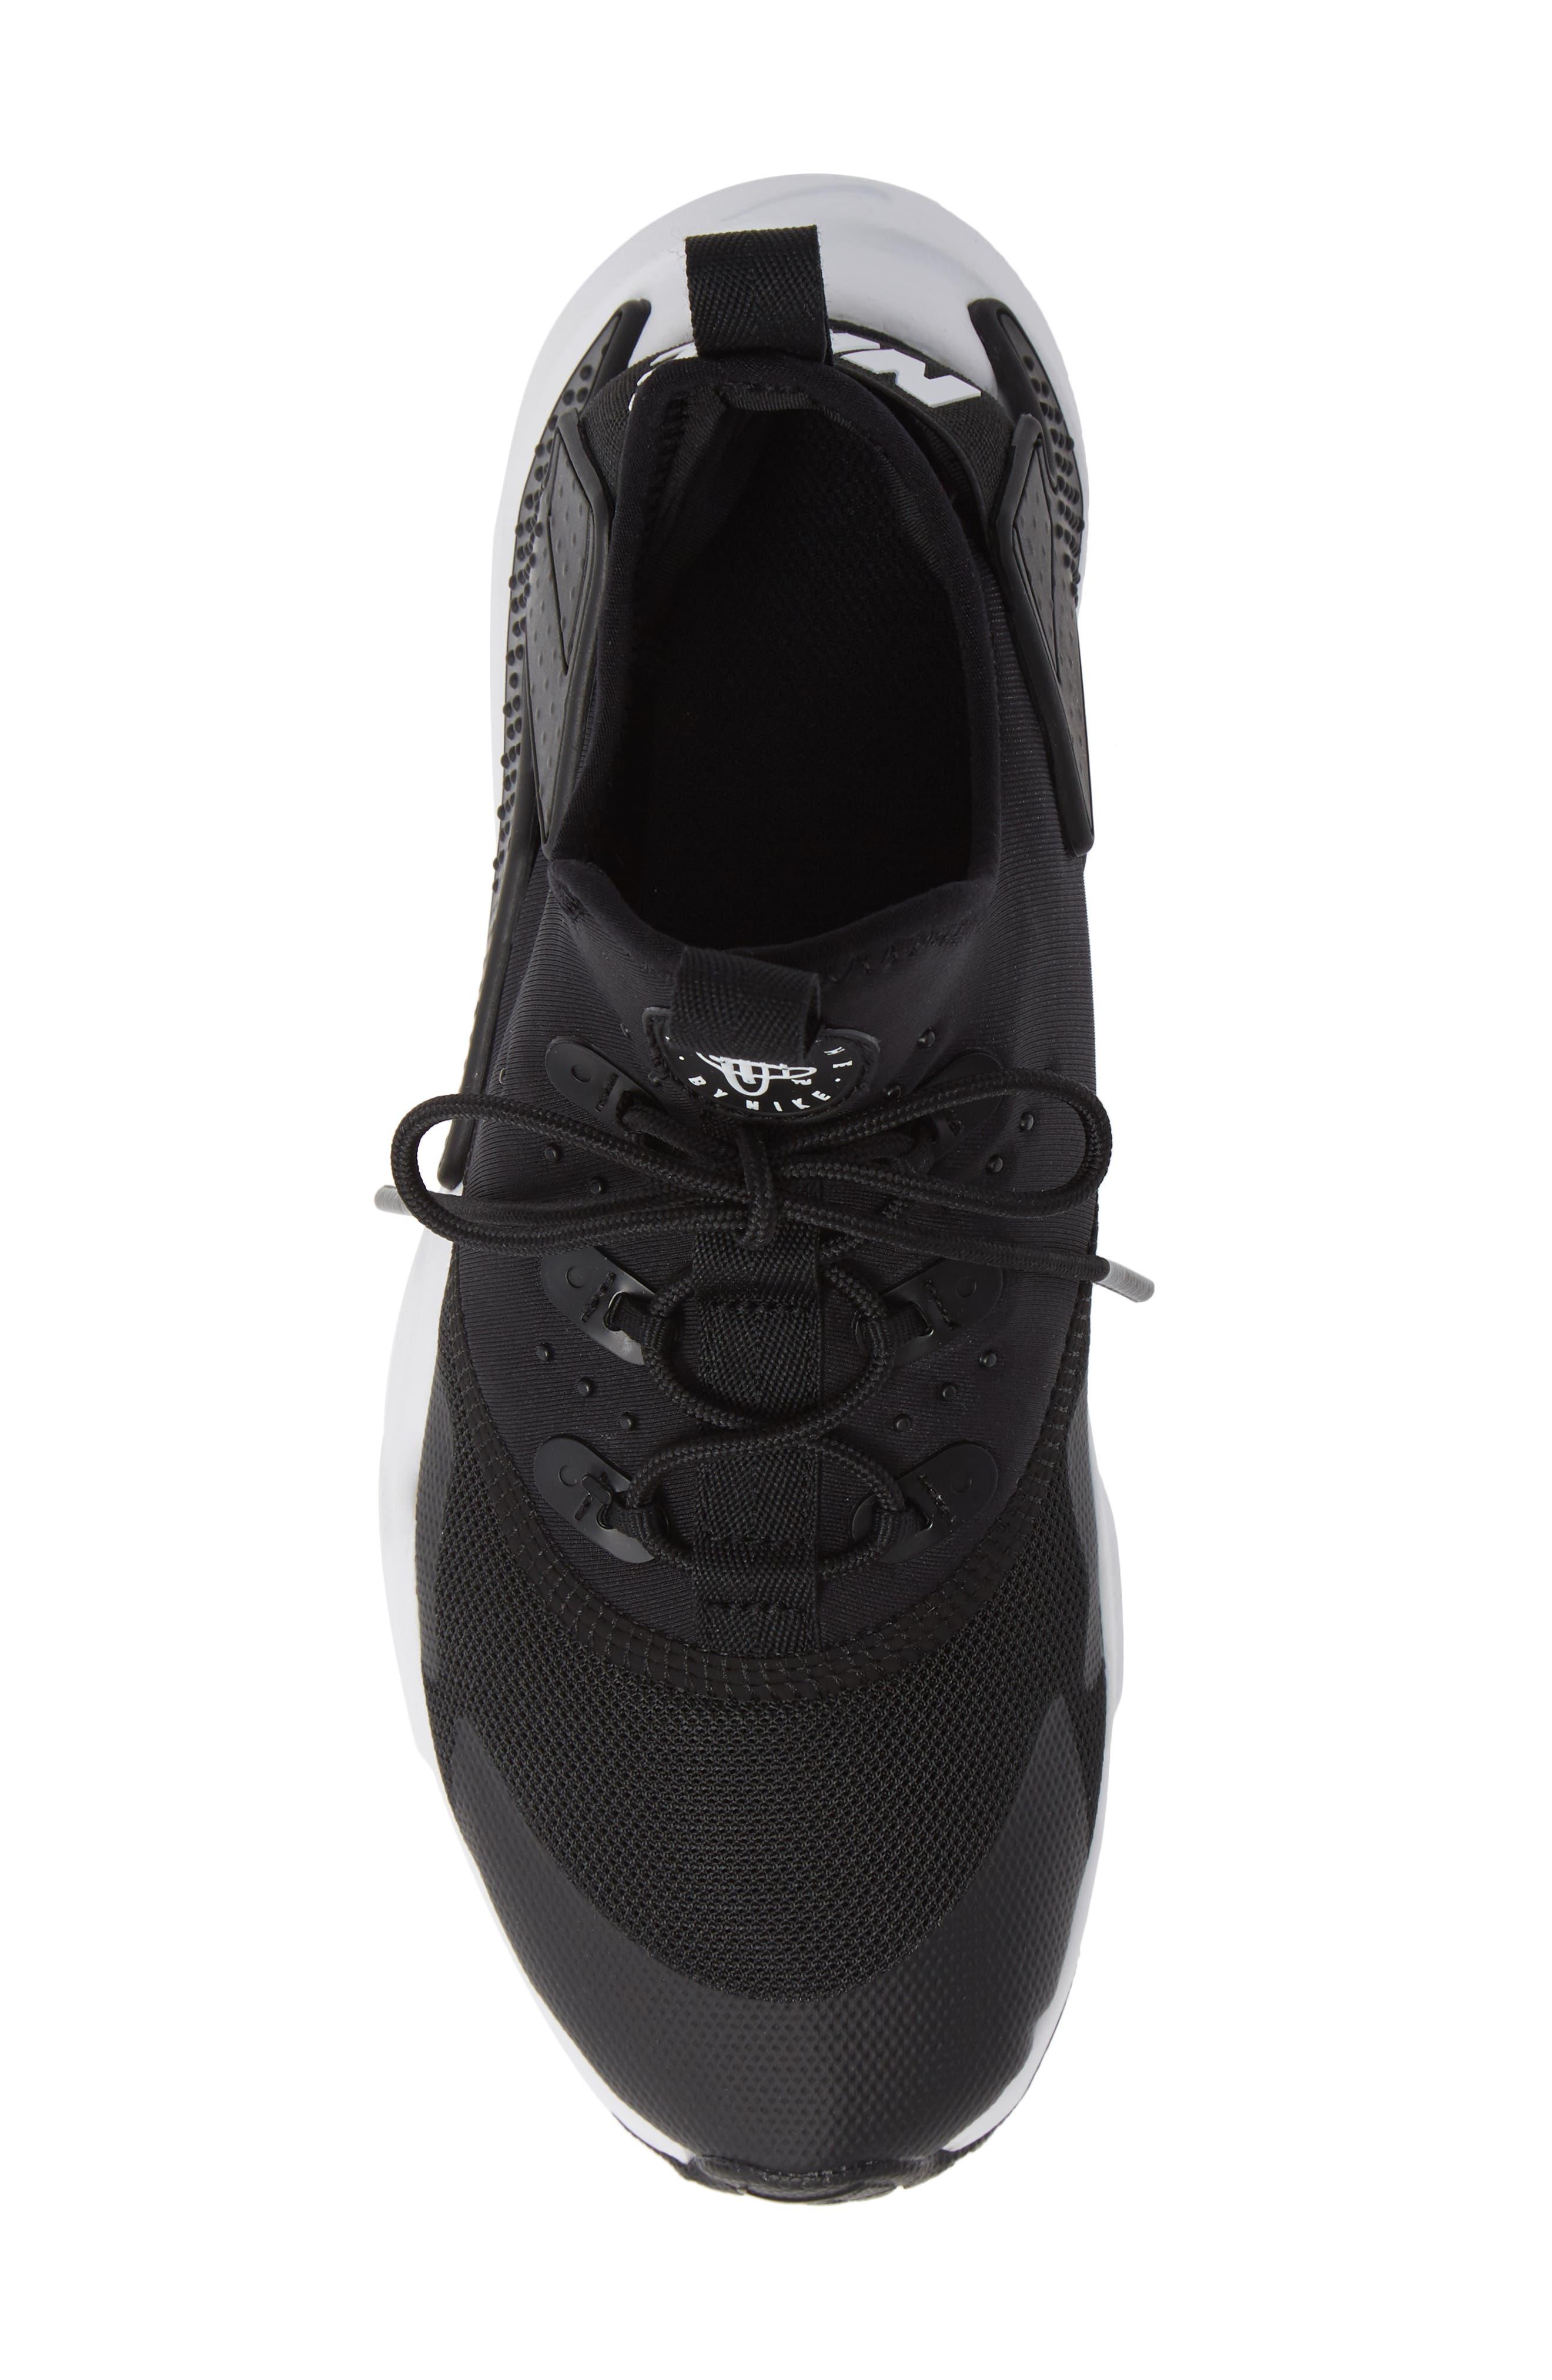 Huarache Run Drift Sneaker,                             Alternate thumbnail 8, color,                             Black/ Anthracite